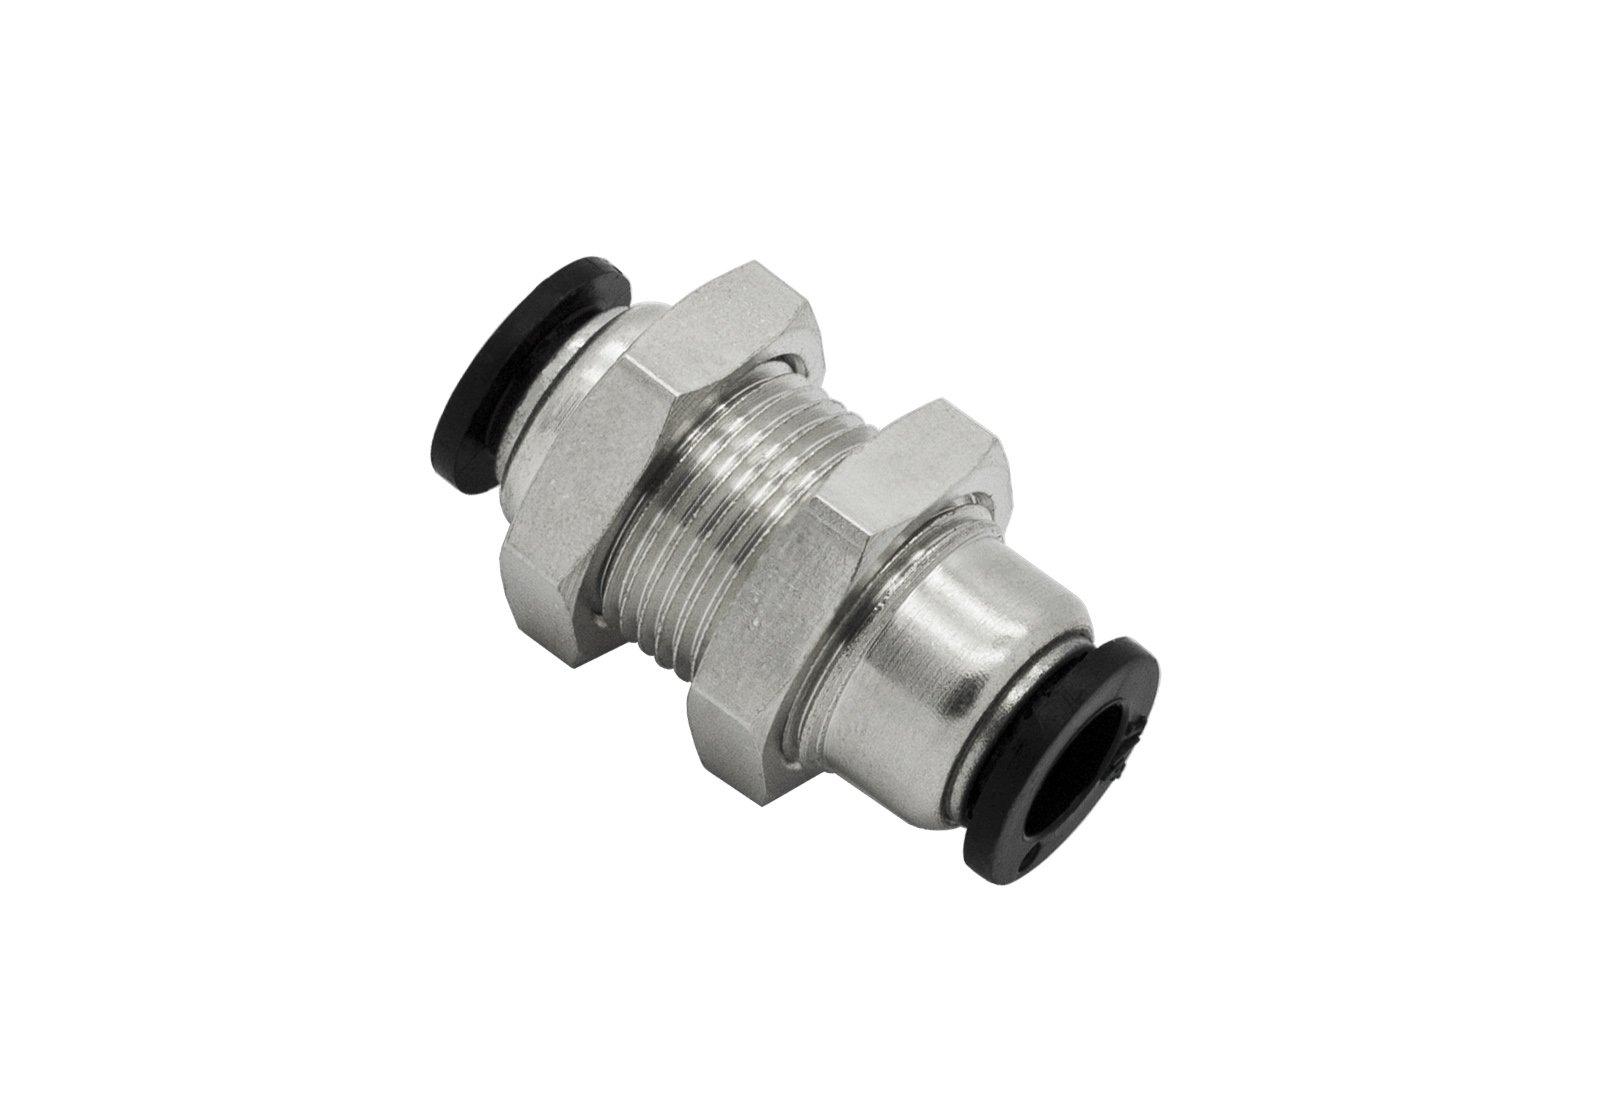 PneumaticPlus PMM-1/4 Push to Connect Tube Fitting, Bulkhead Union - 1/4'' Tube OD x 1/4'' Tube OD (10 per pack)